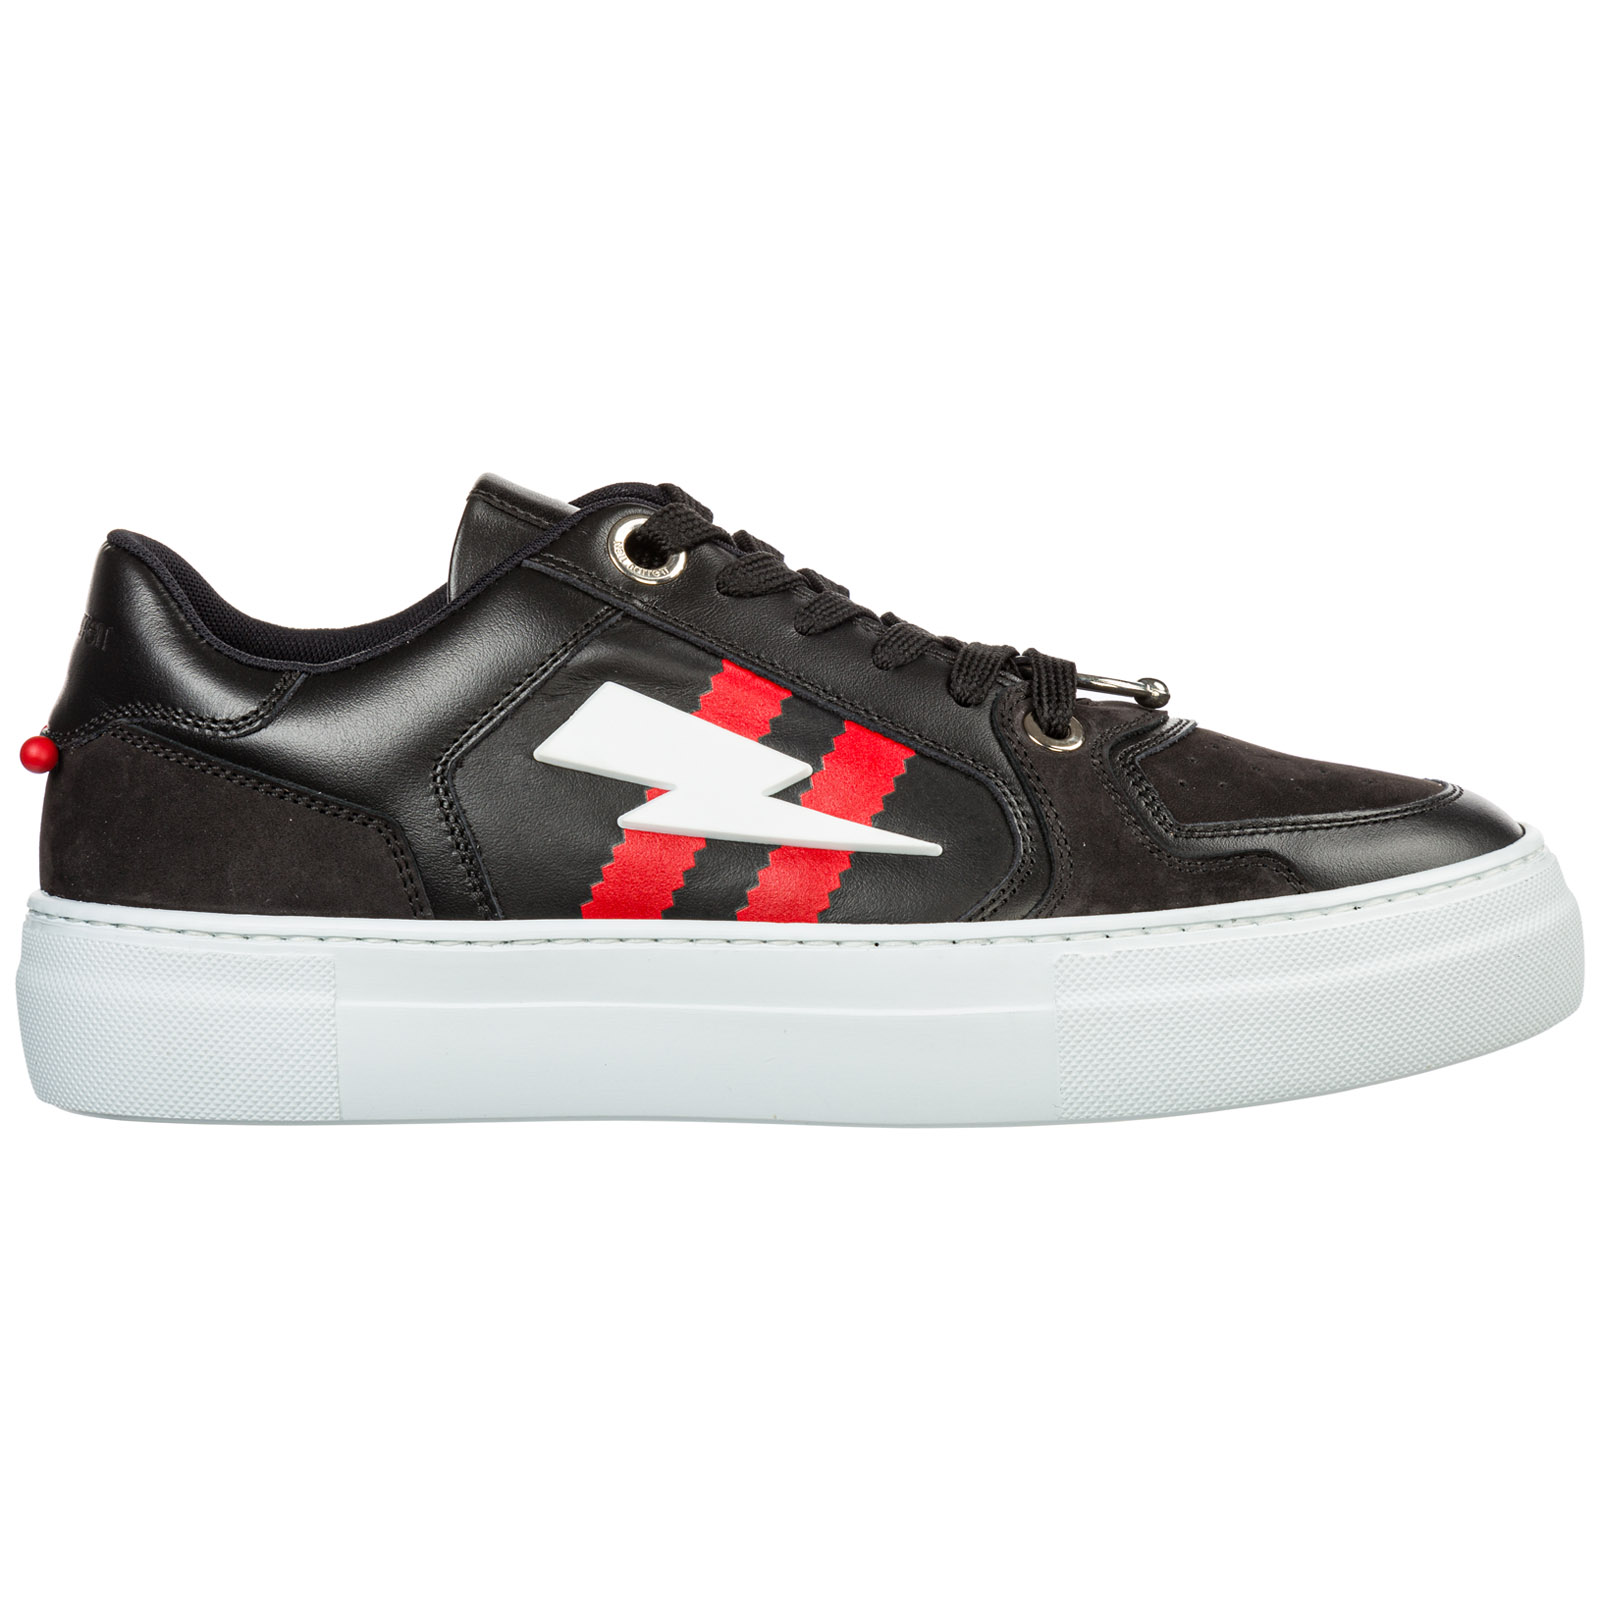 Sneakers Neil Barrett modernist